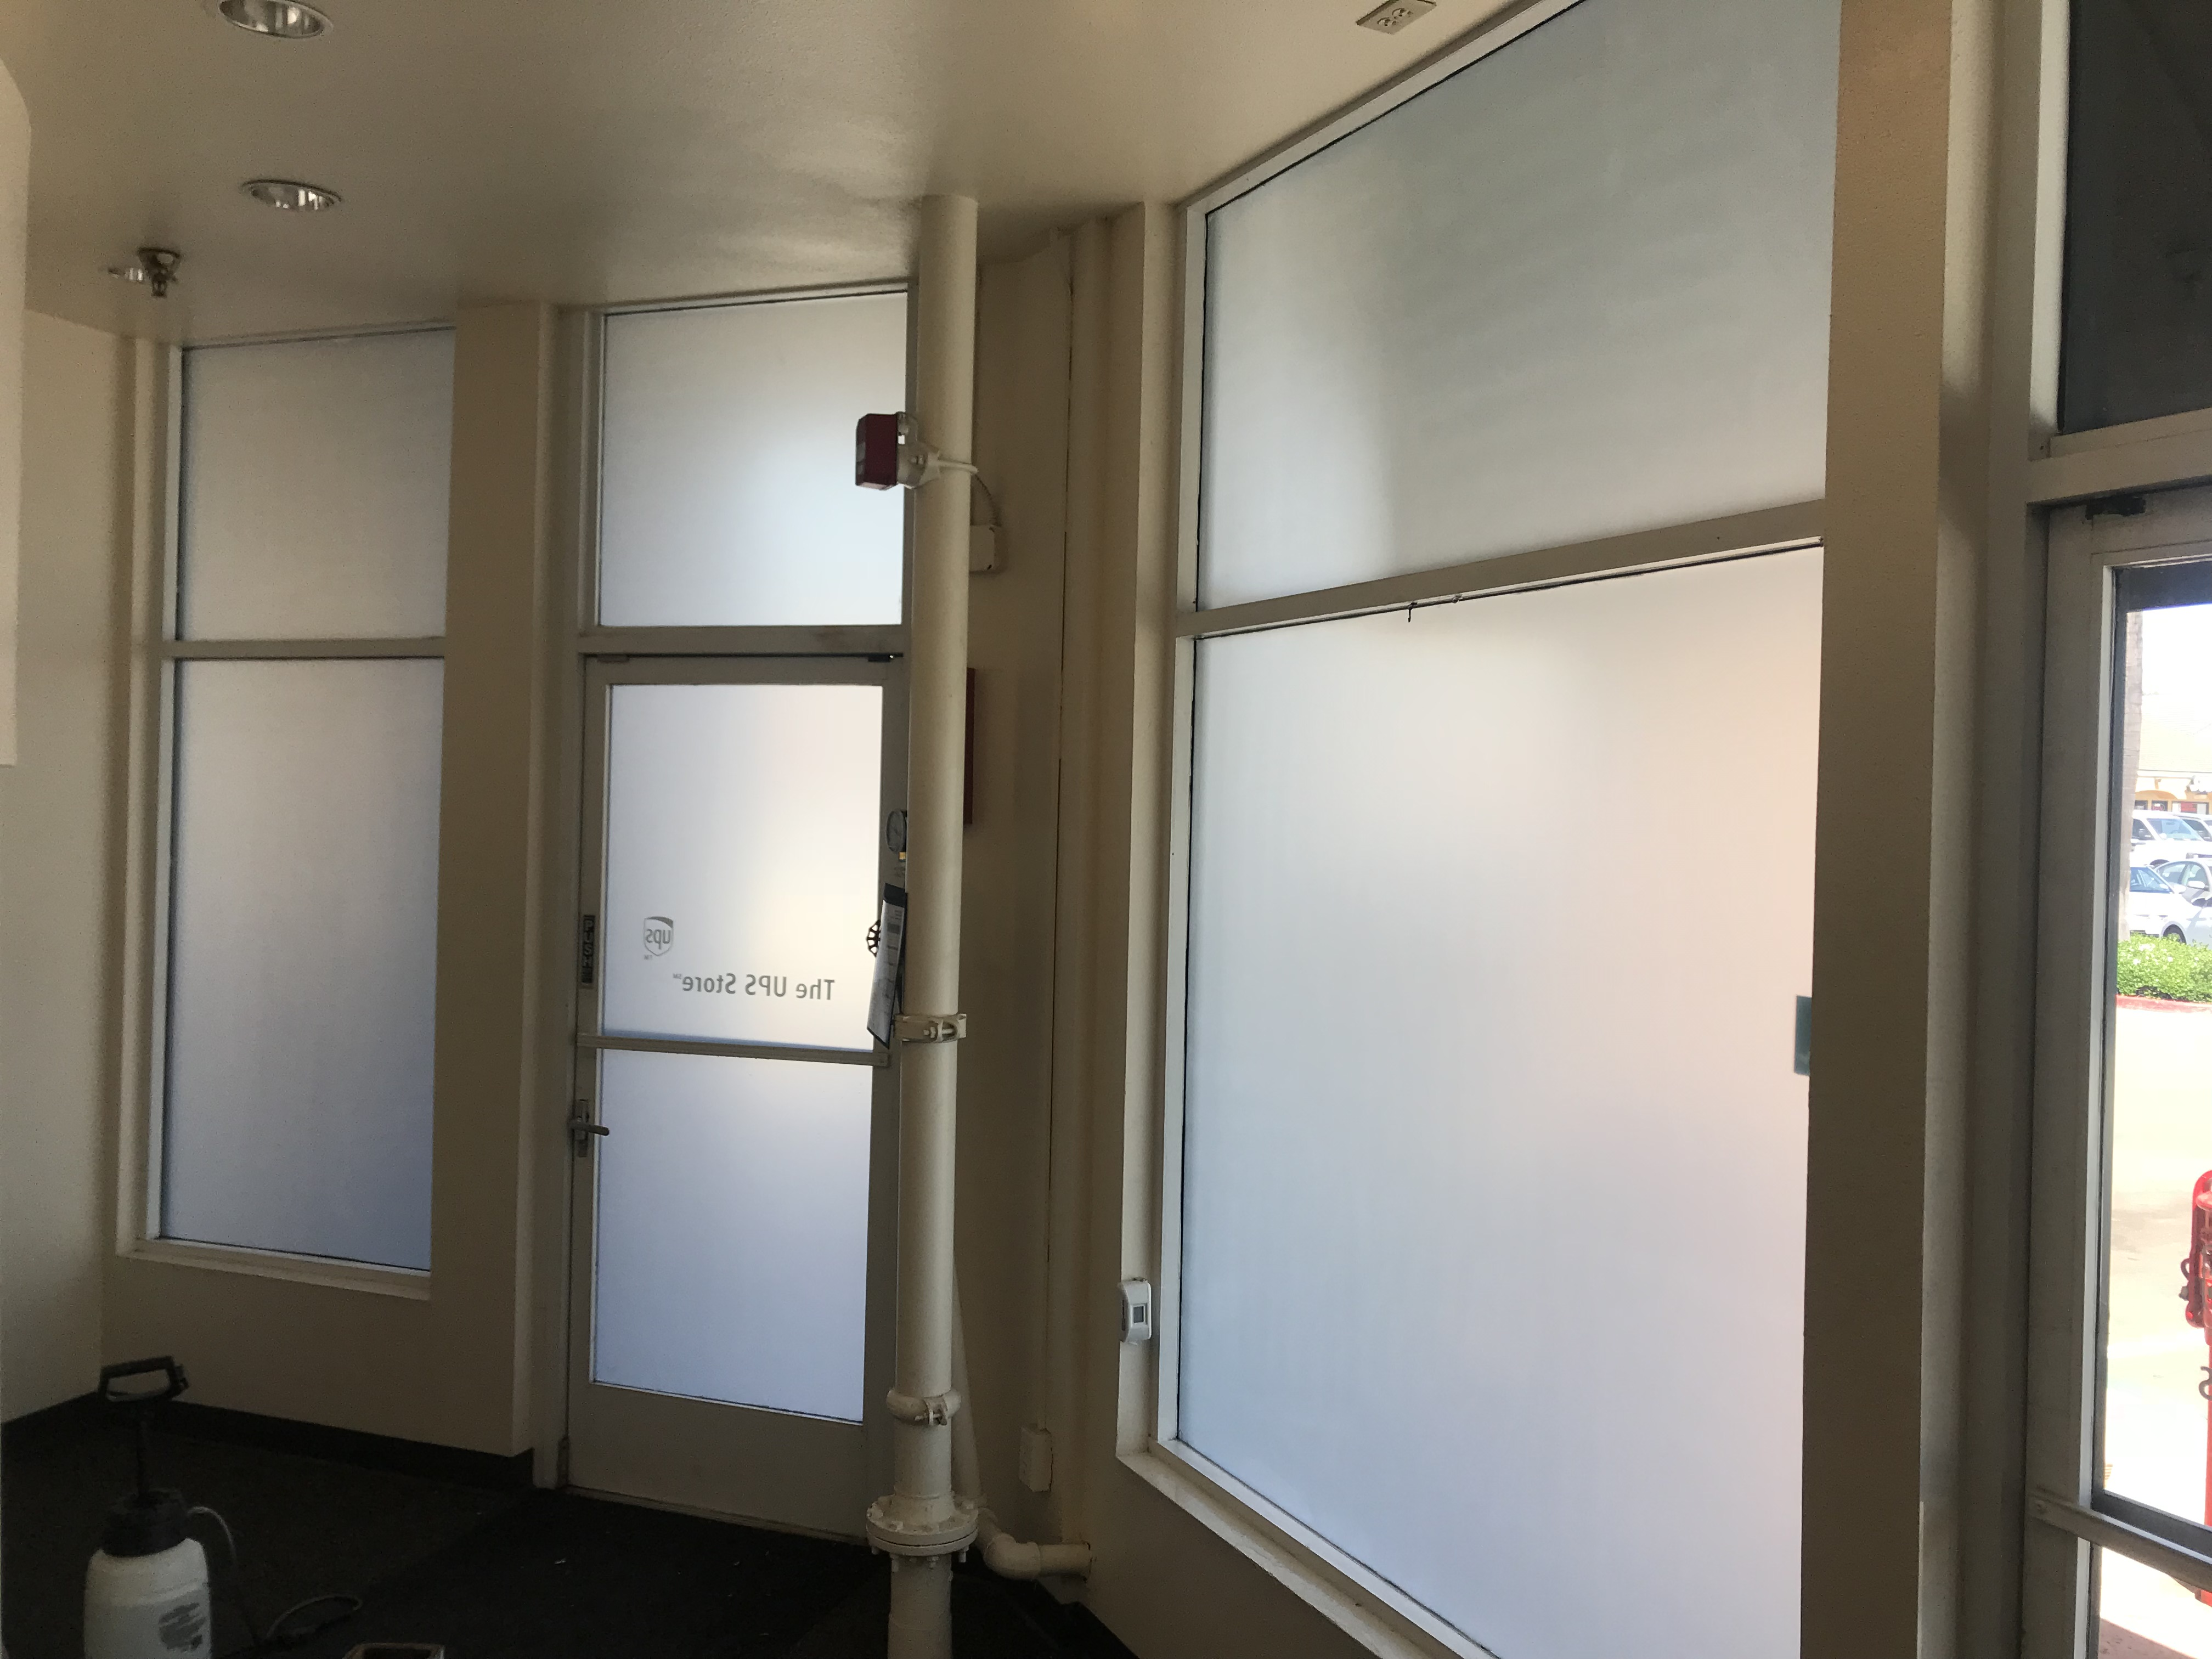 white frost film, privacy film, commercial film, 3m window film, best window tint shop